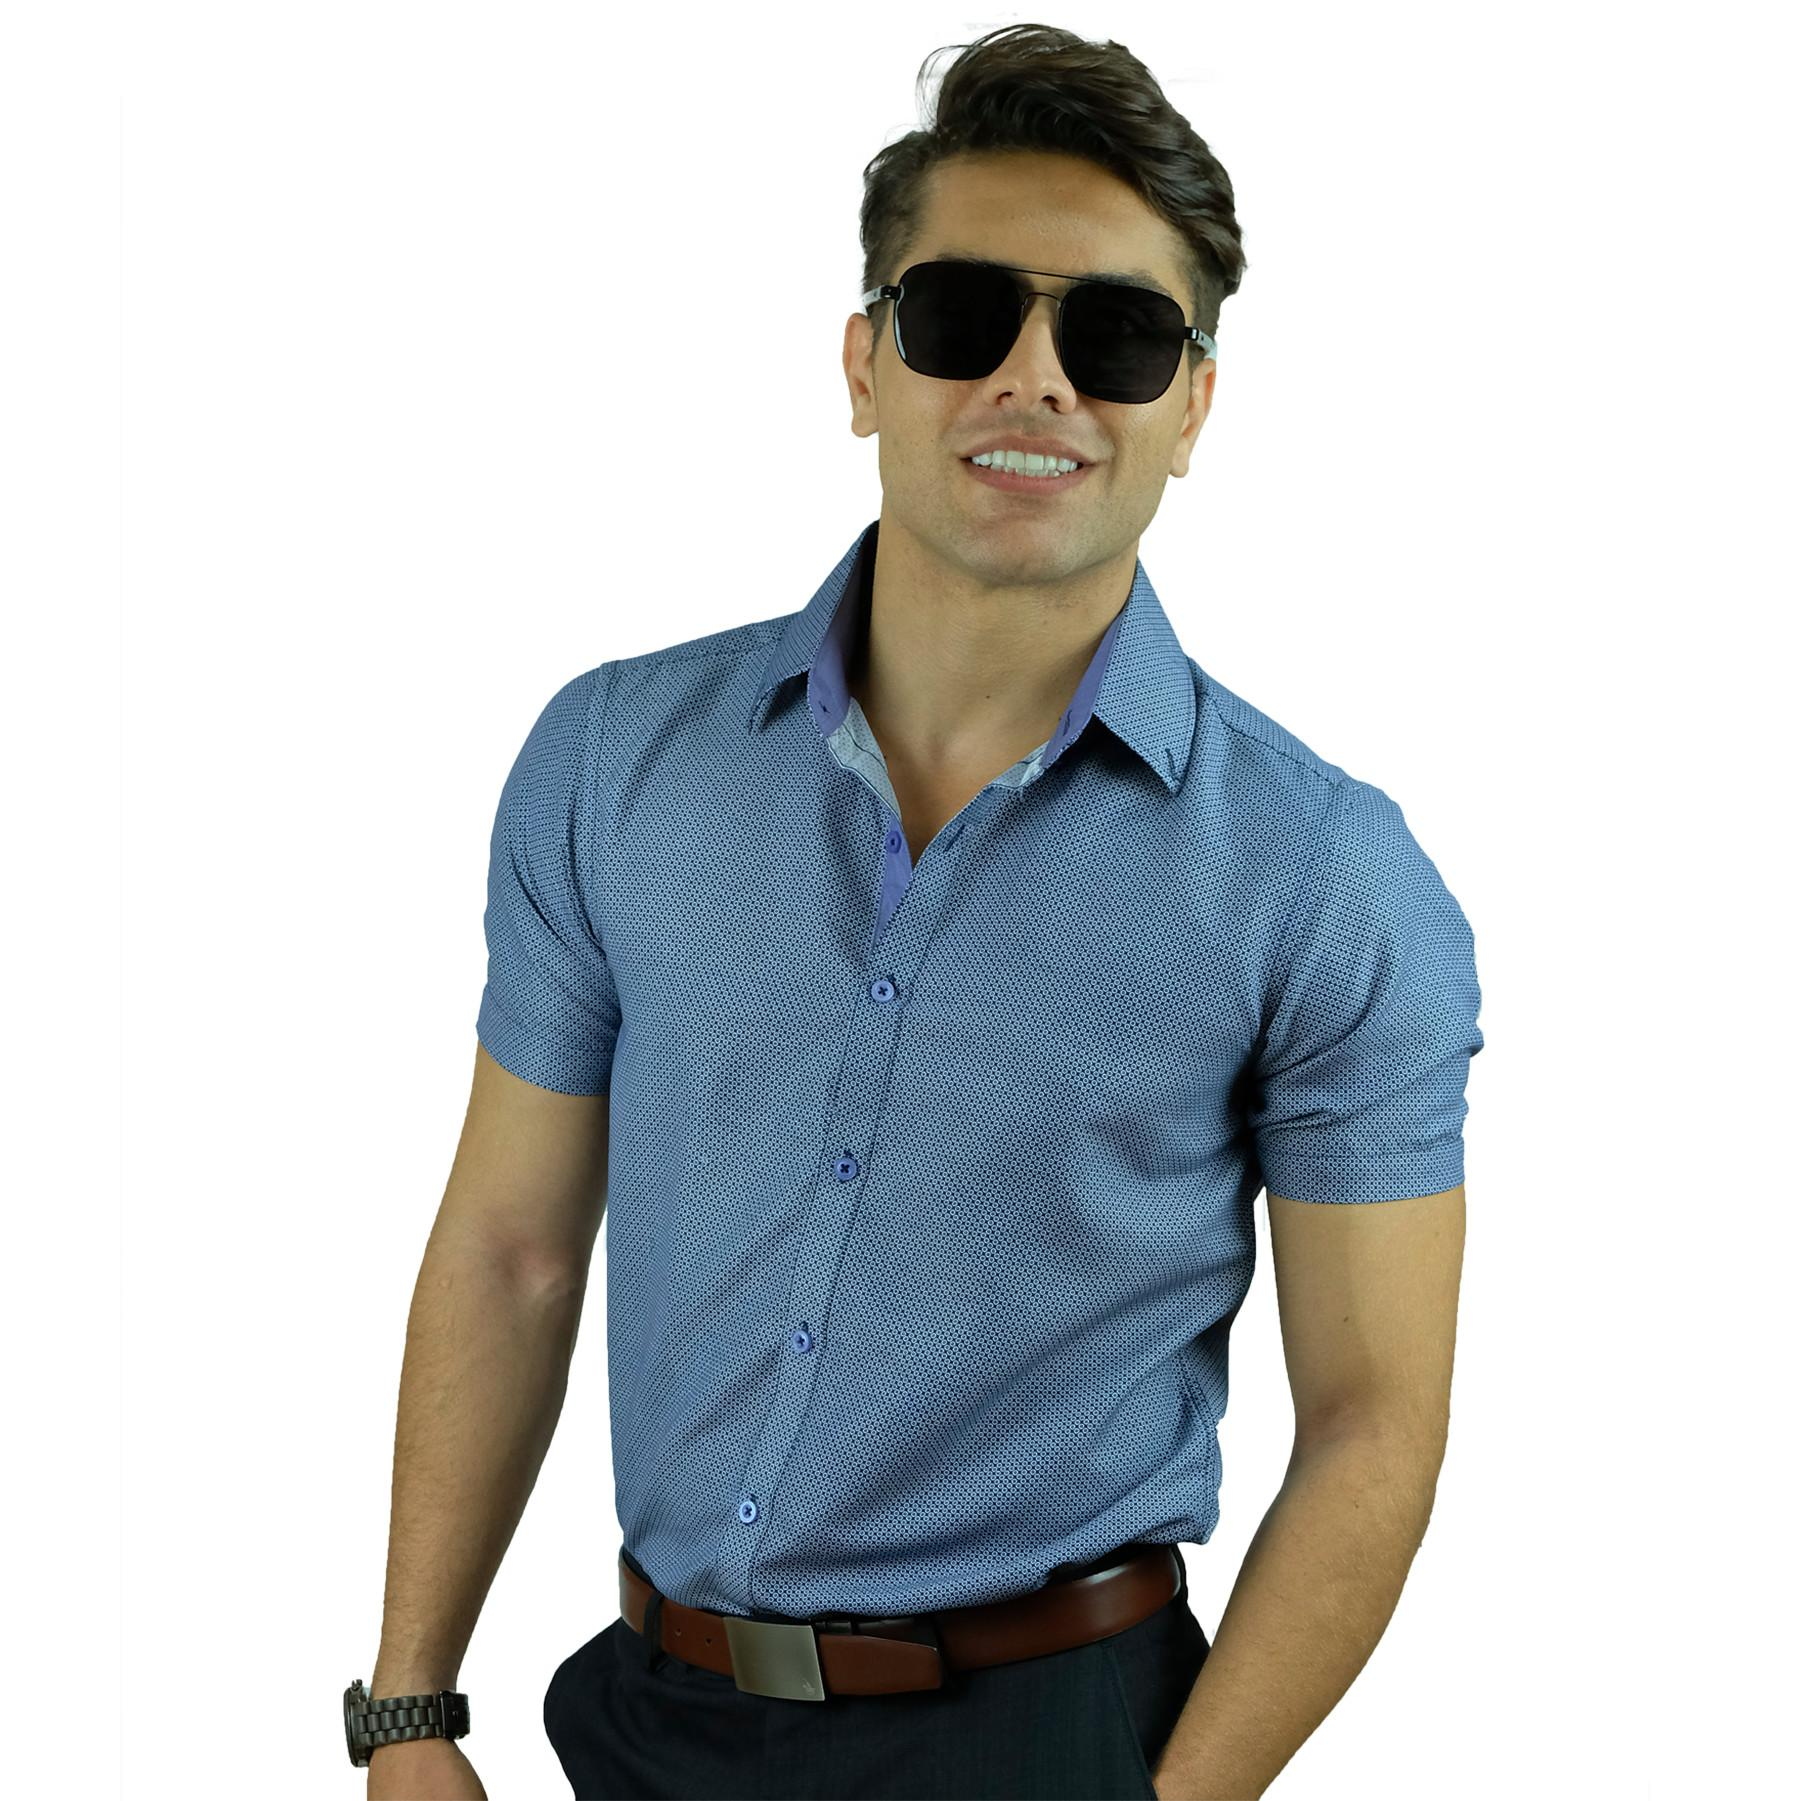 4da165f6b5c PROFILE by IDENTITY Mens Printed Button Down Smart Casual Short Sleeve Shirt  - K1100-02